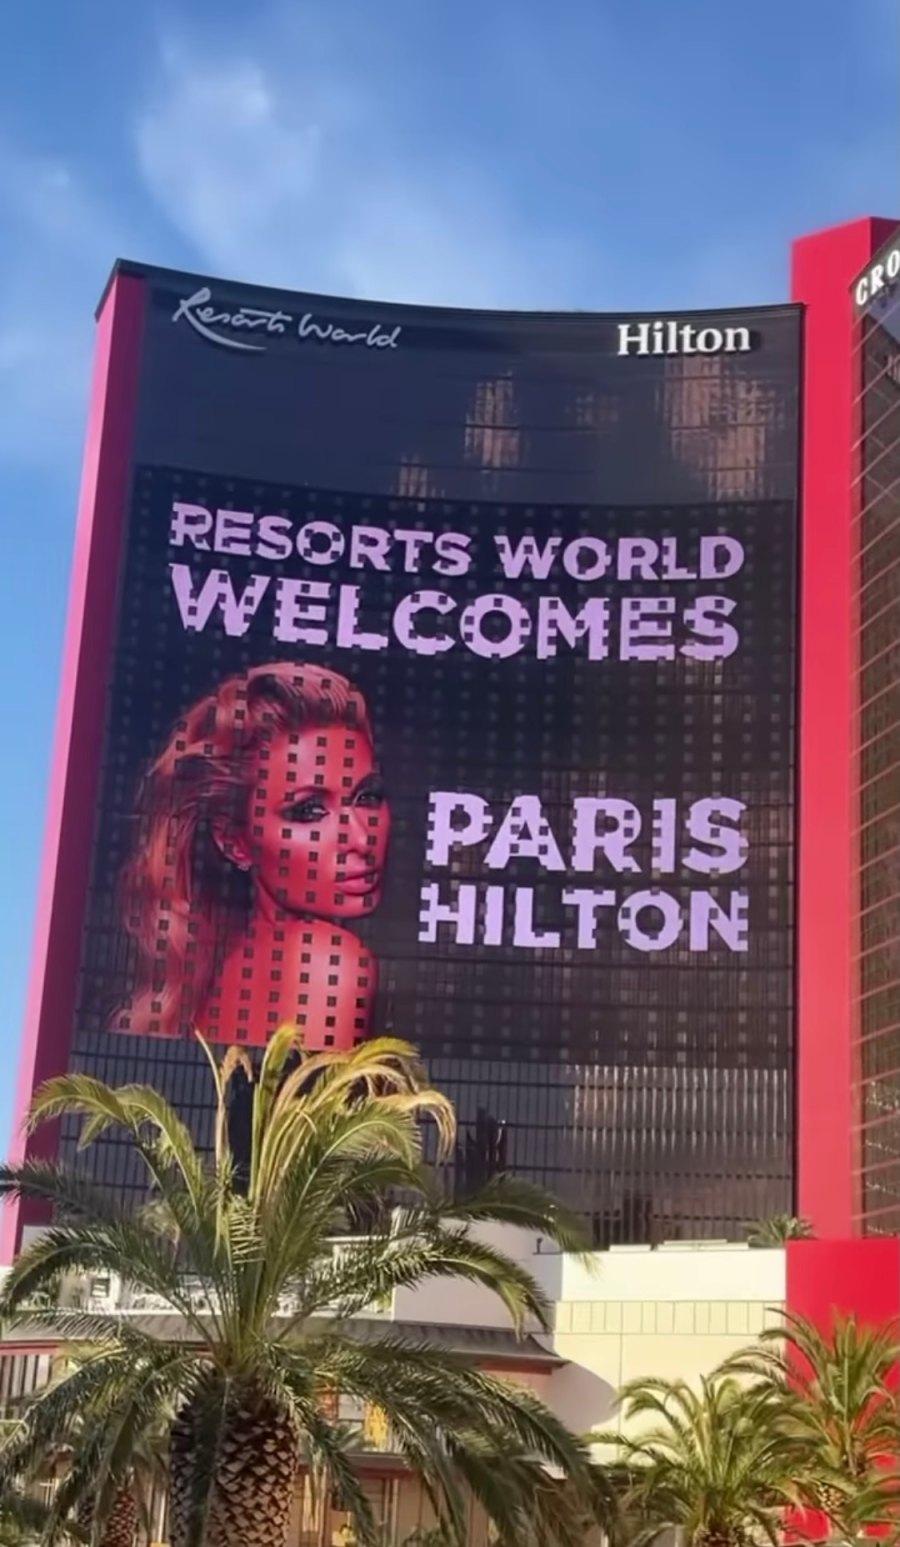 Resorts World Welcomes Paris Hilton sign